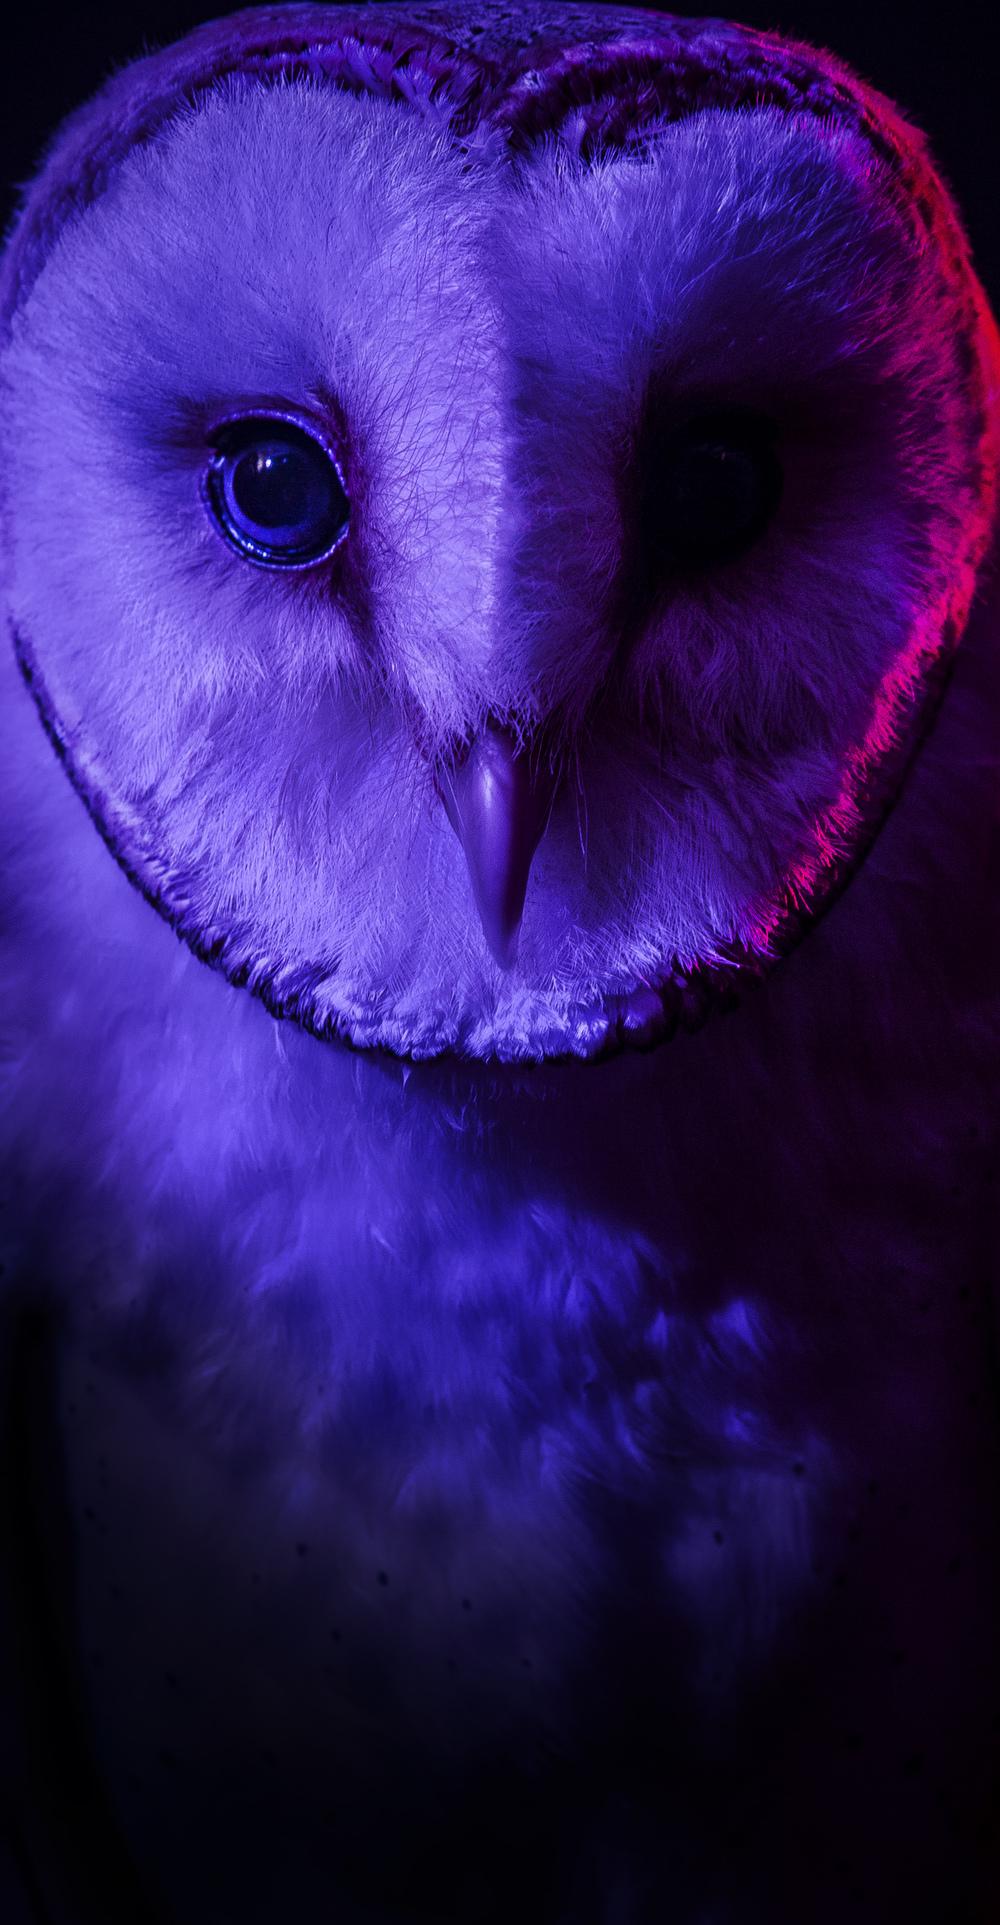 Owl (DoeZoo)